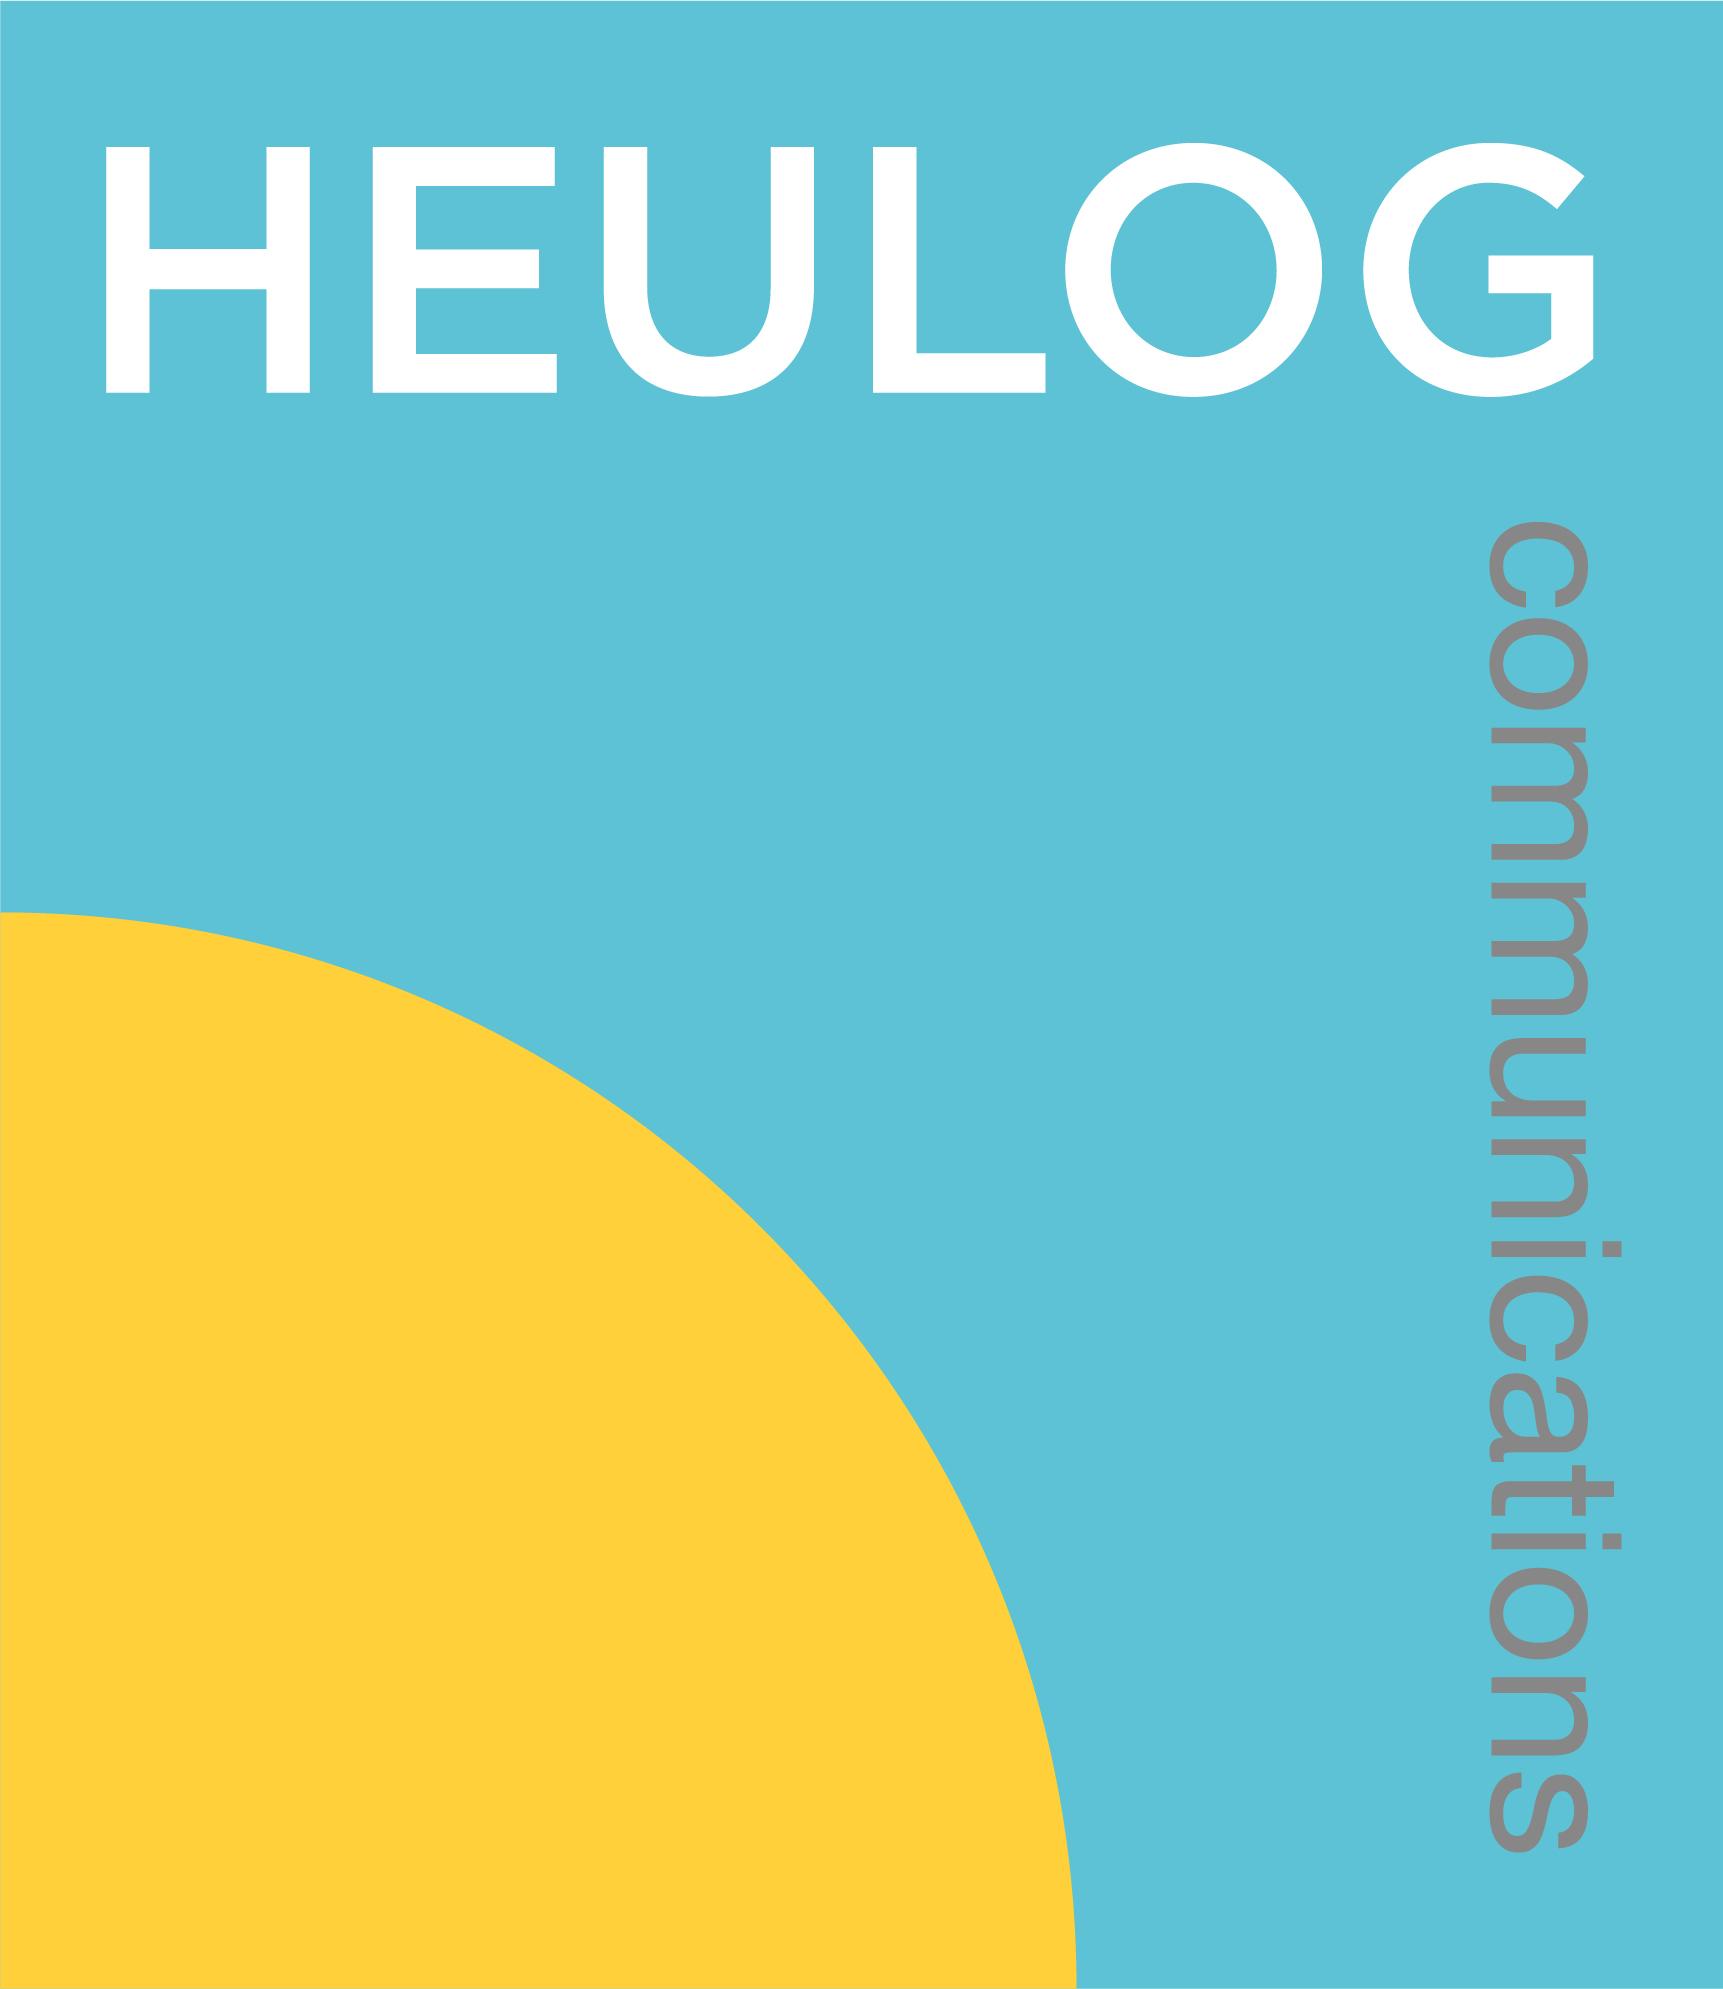 Heulog Communications